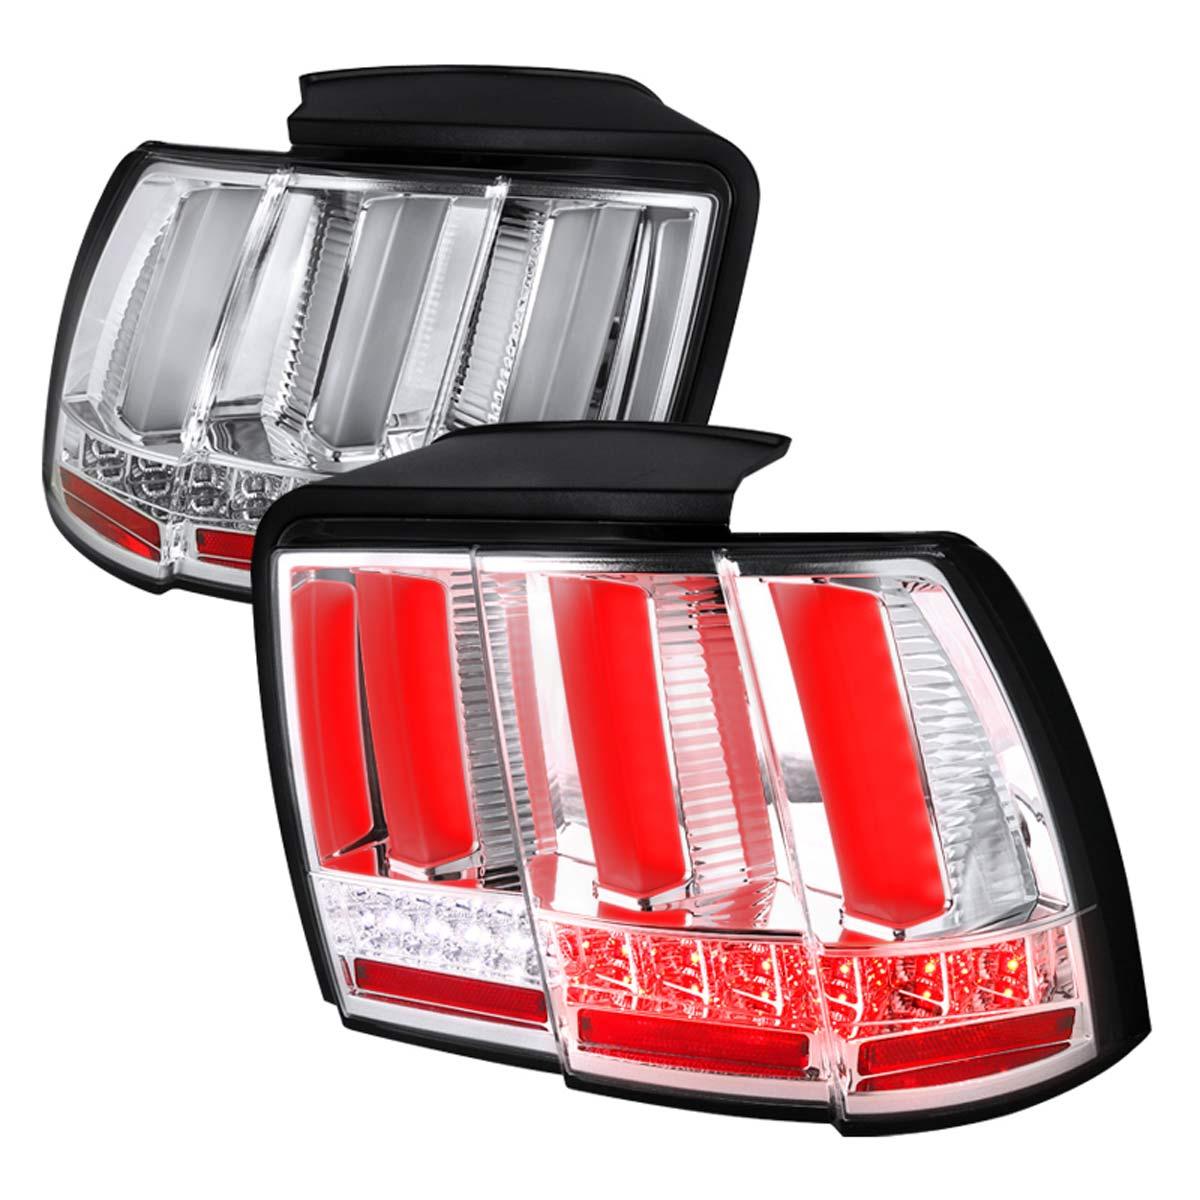 Suzuki Cled Tail Light